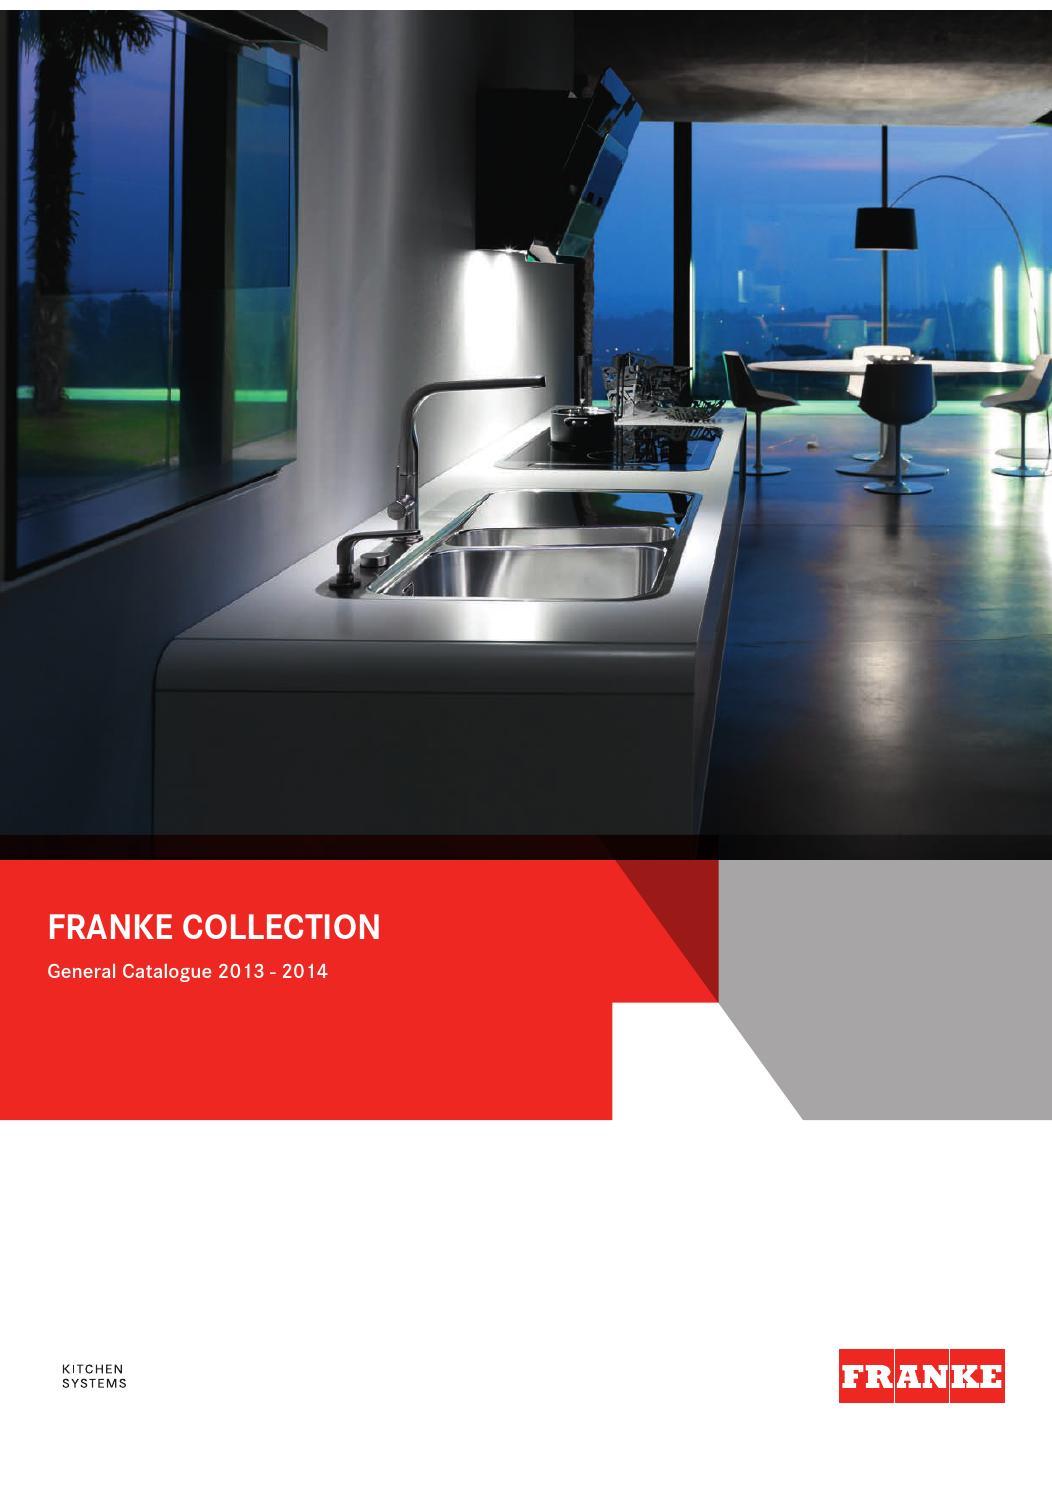 Franke Appliances : ISSUU - Franke New Zealand 2013 by Kitchen Appliances